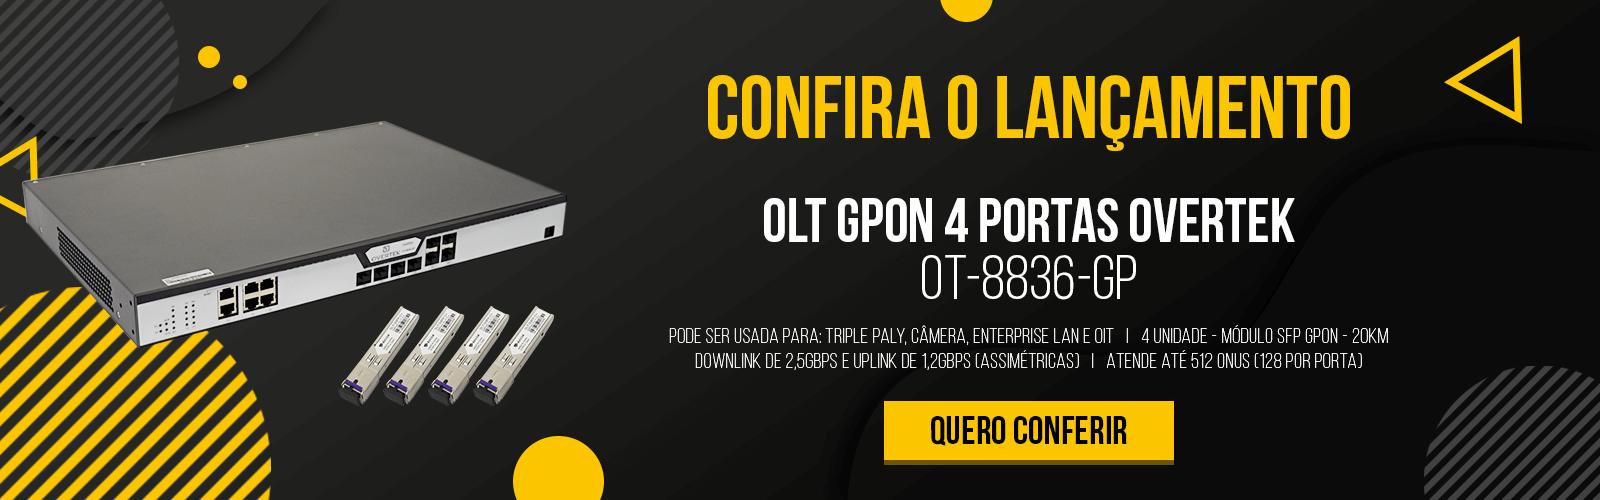 Laçamento OLT Gpon 4 Portas da Overtek!